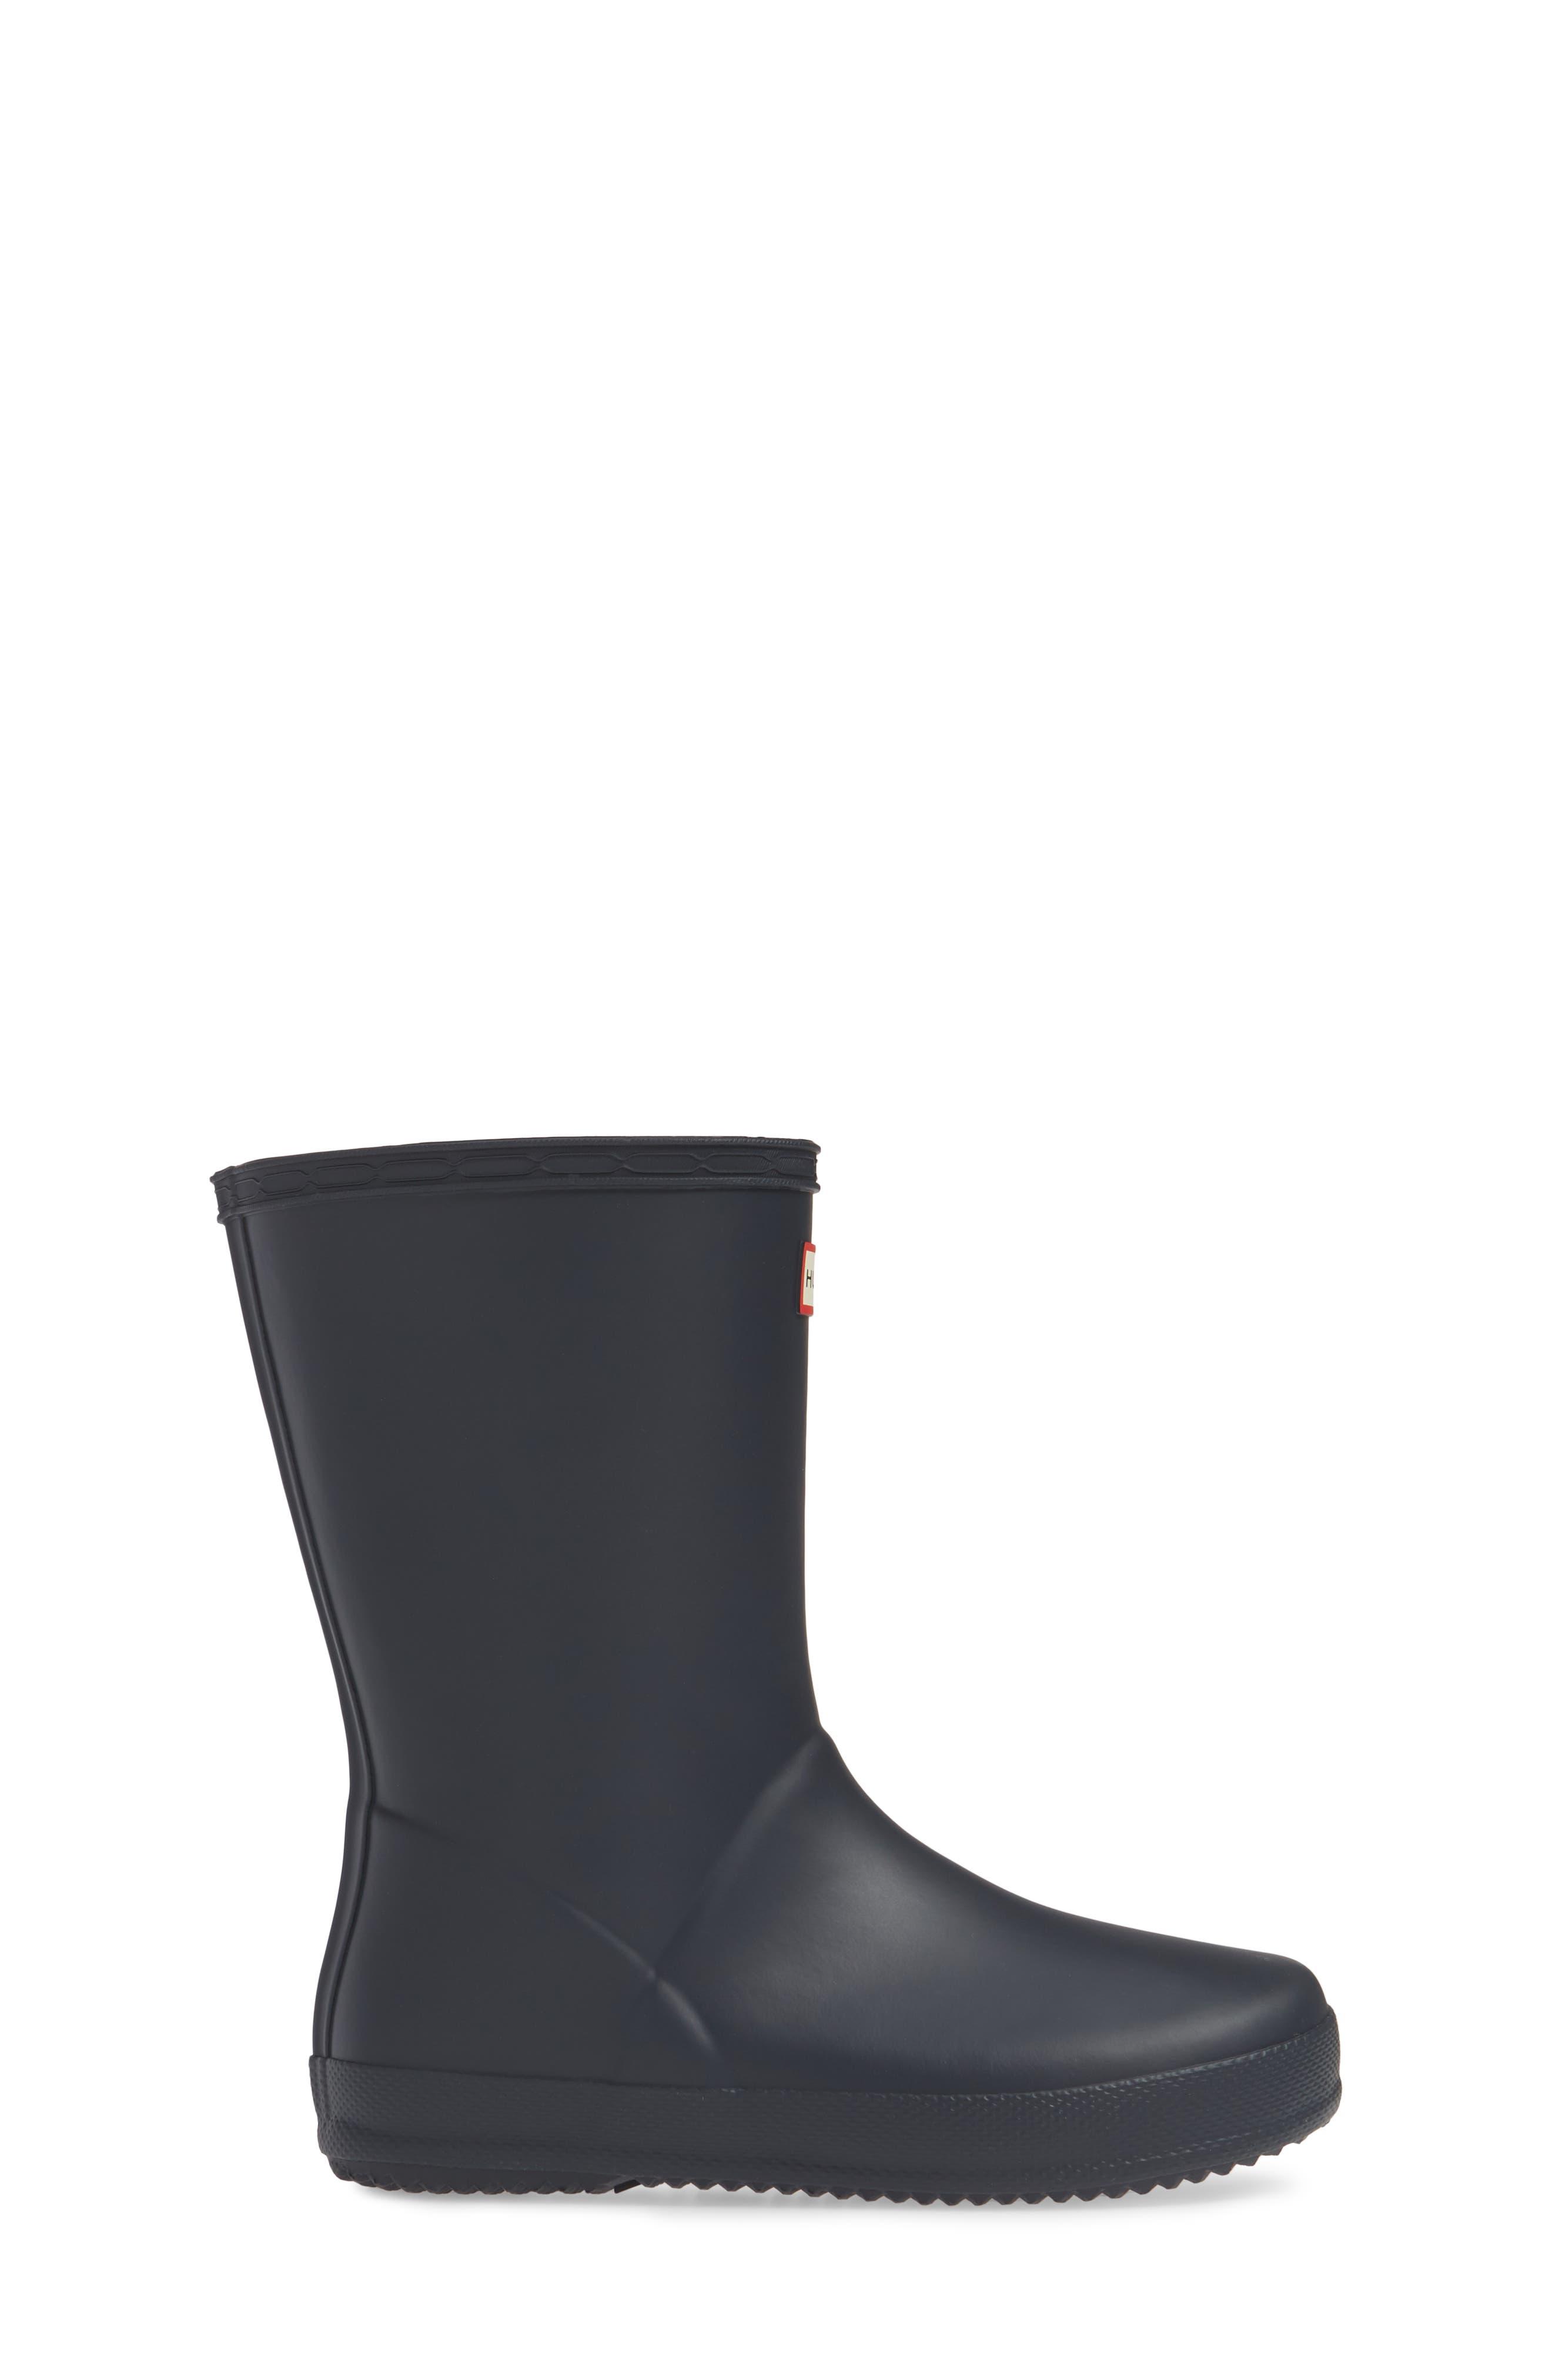 HUNTER,                             First Classic Waterproof Rain Boot,                             Alternate thumbnail 4, color,                             NAVY